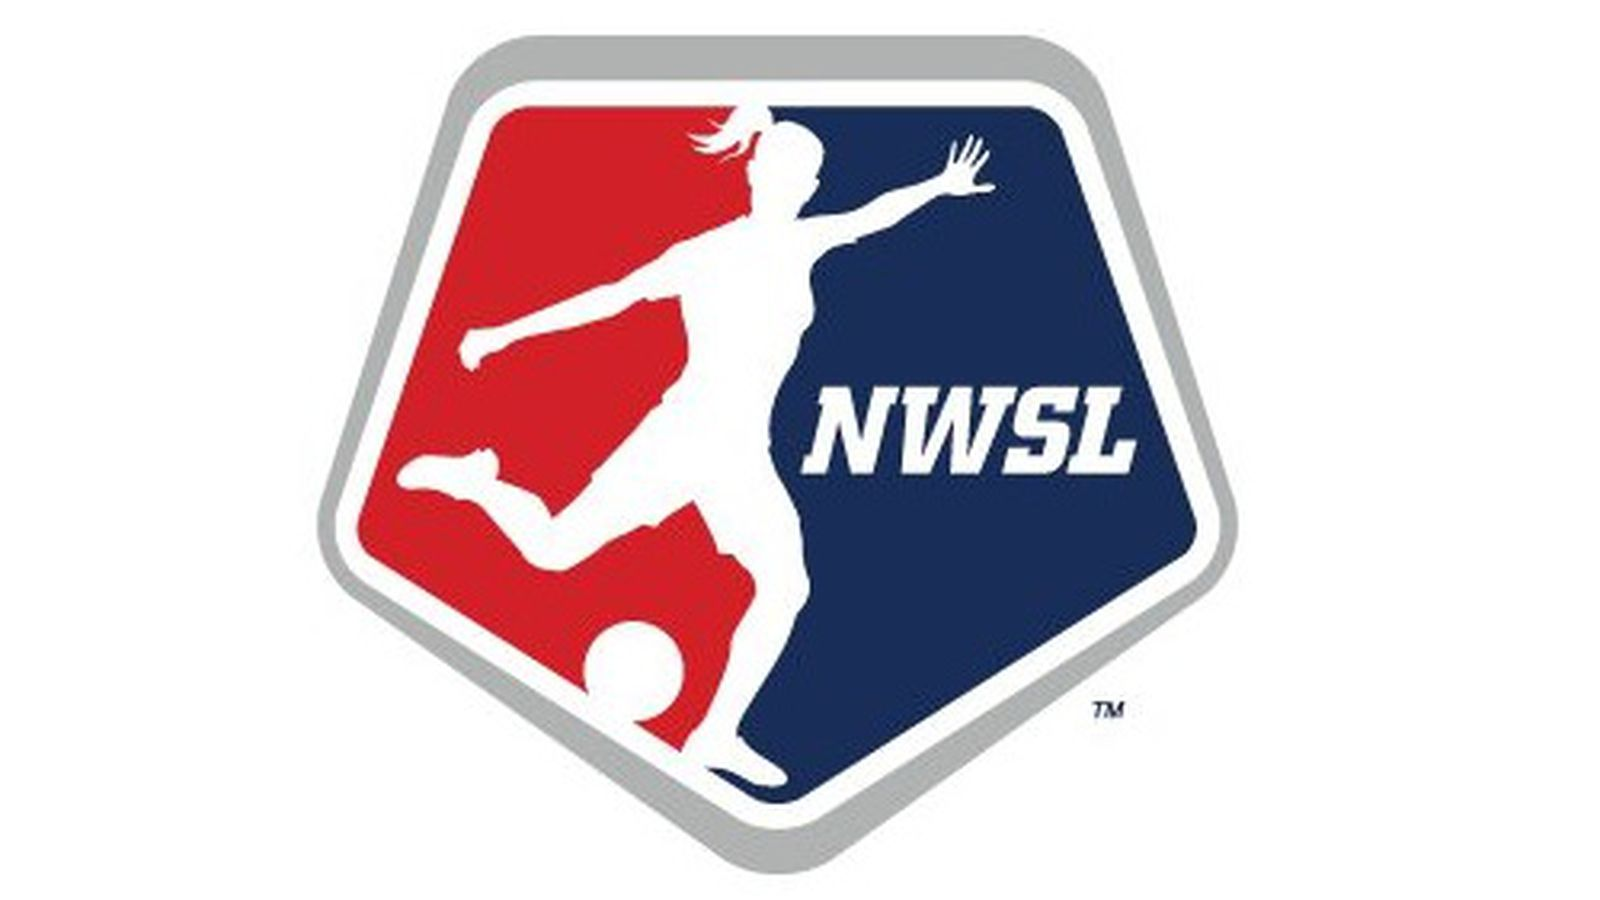 Nwsl_logo_wide.0.0